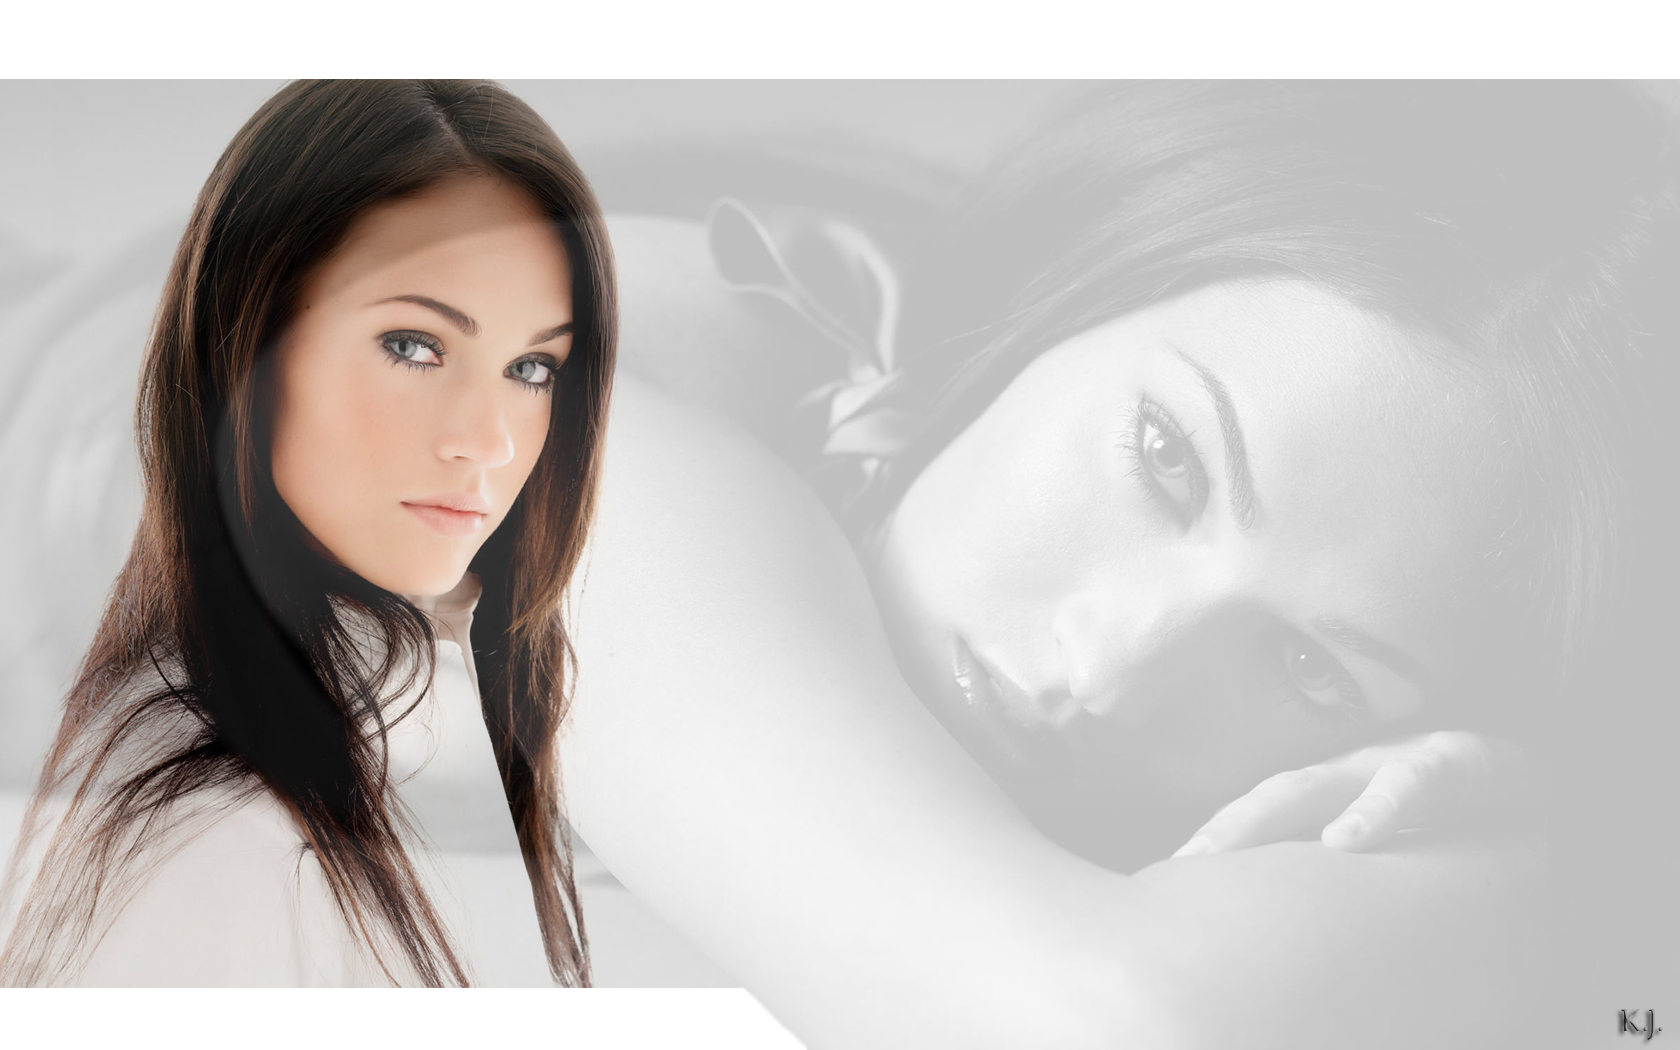 Megan FOX by klawatsch